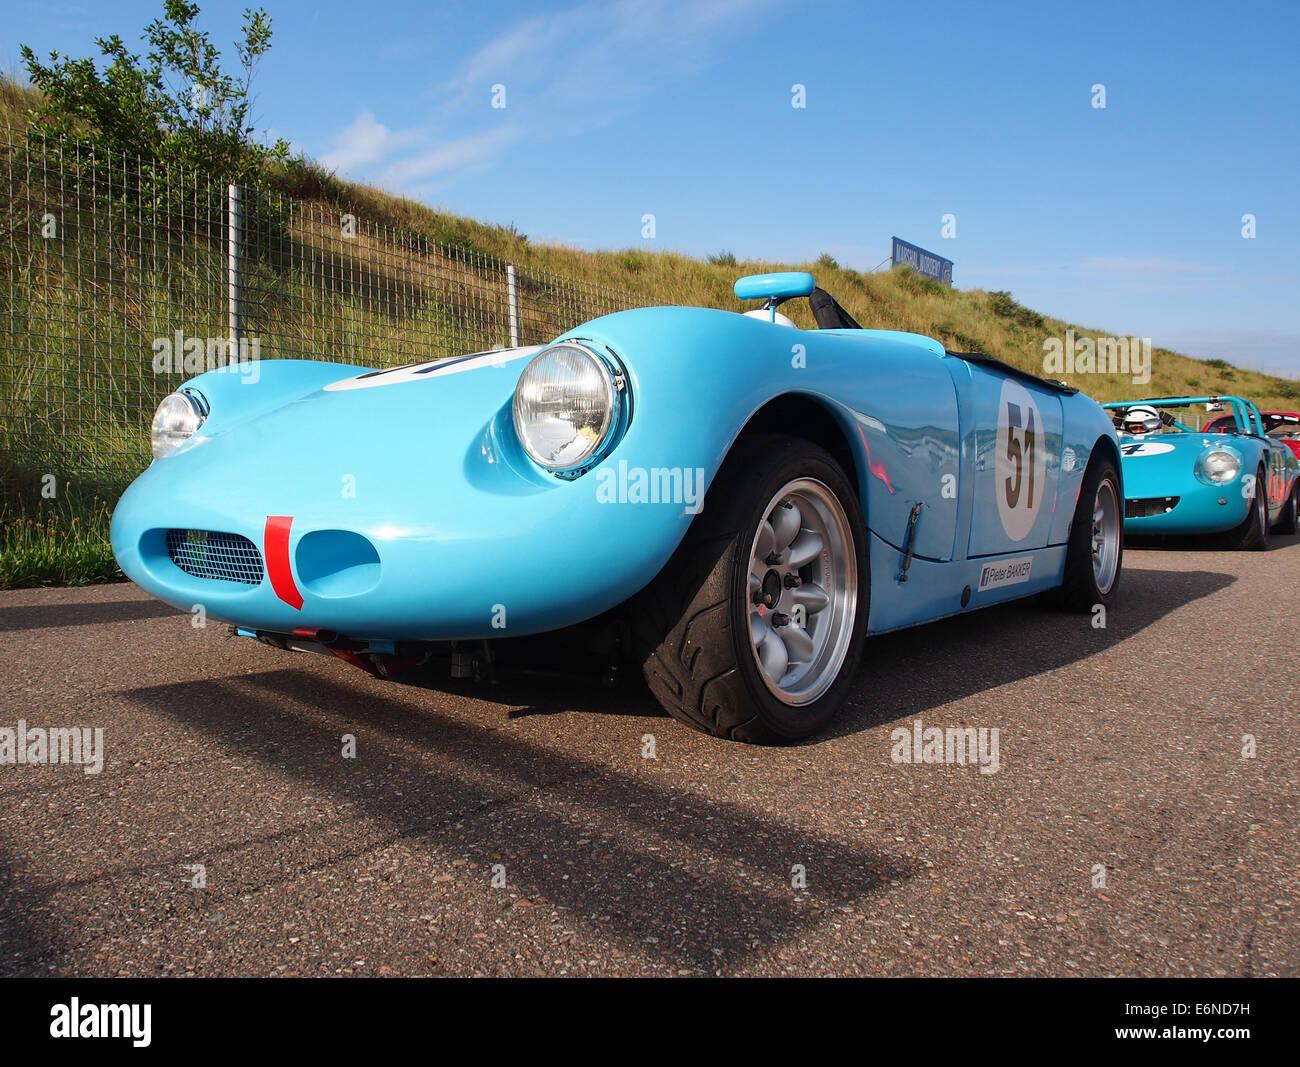 Austin Healey Sprite Monza - No52, Pieter Bakker in Zandvoort, pic3 Stockbild